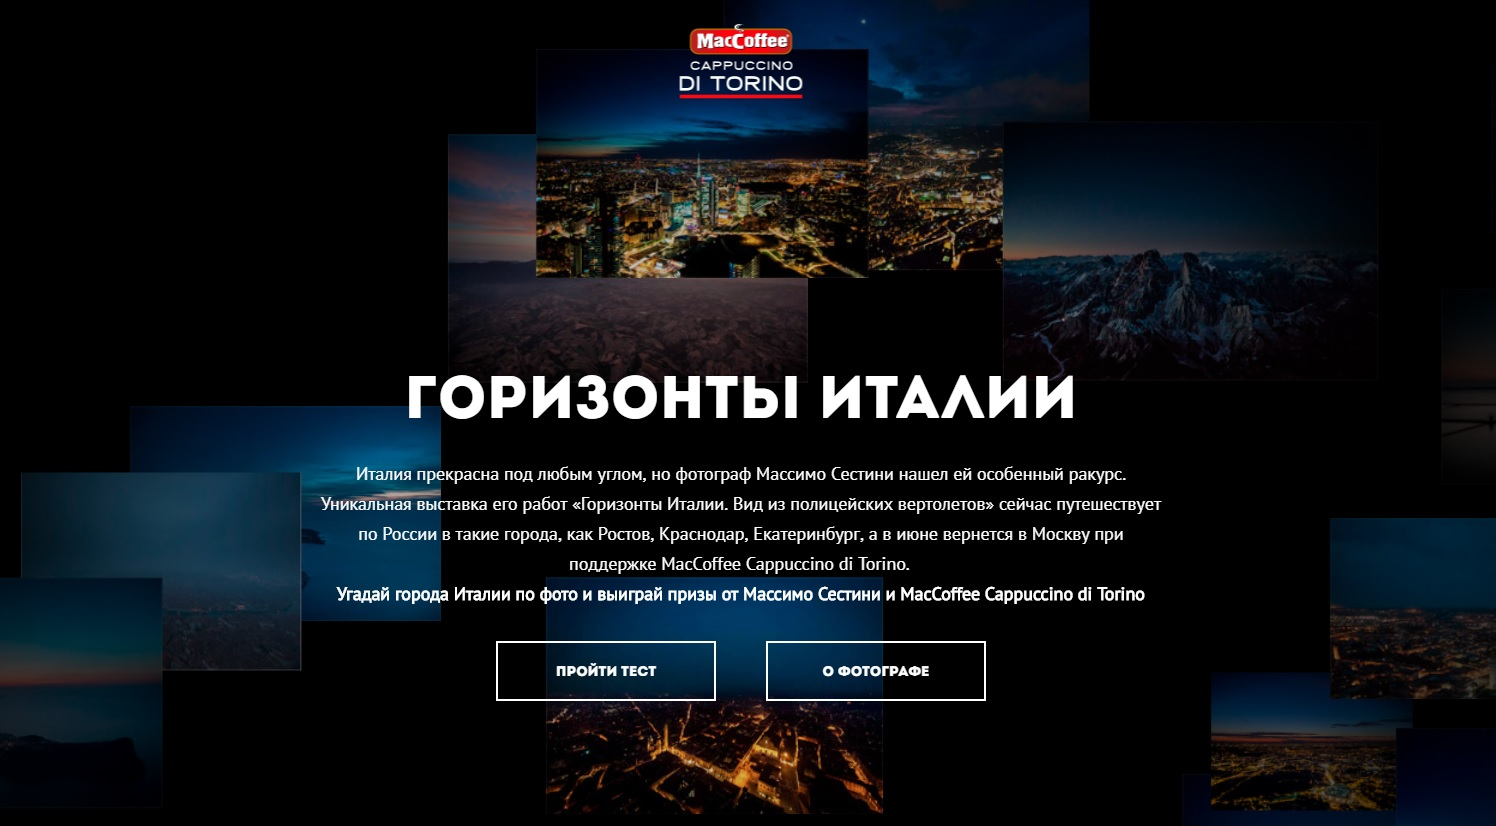 italianhorizons.ru регистрация промо кода в 2019 году